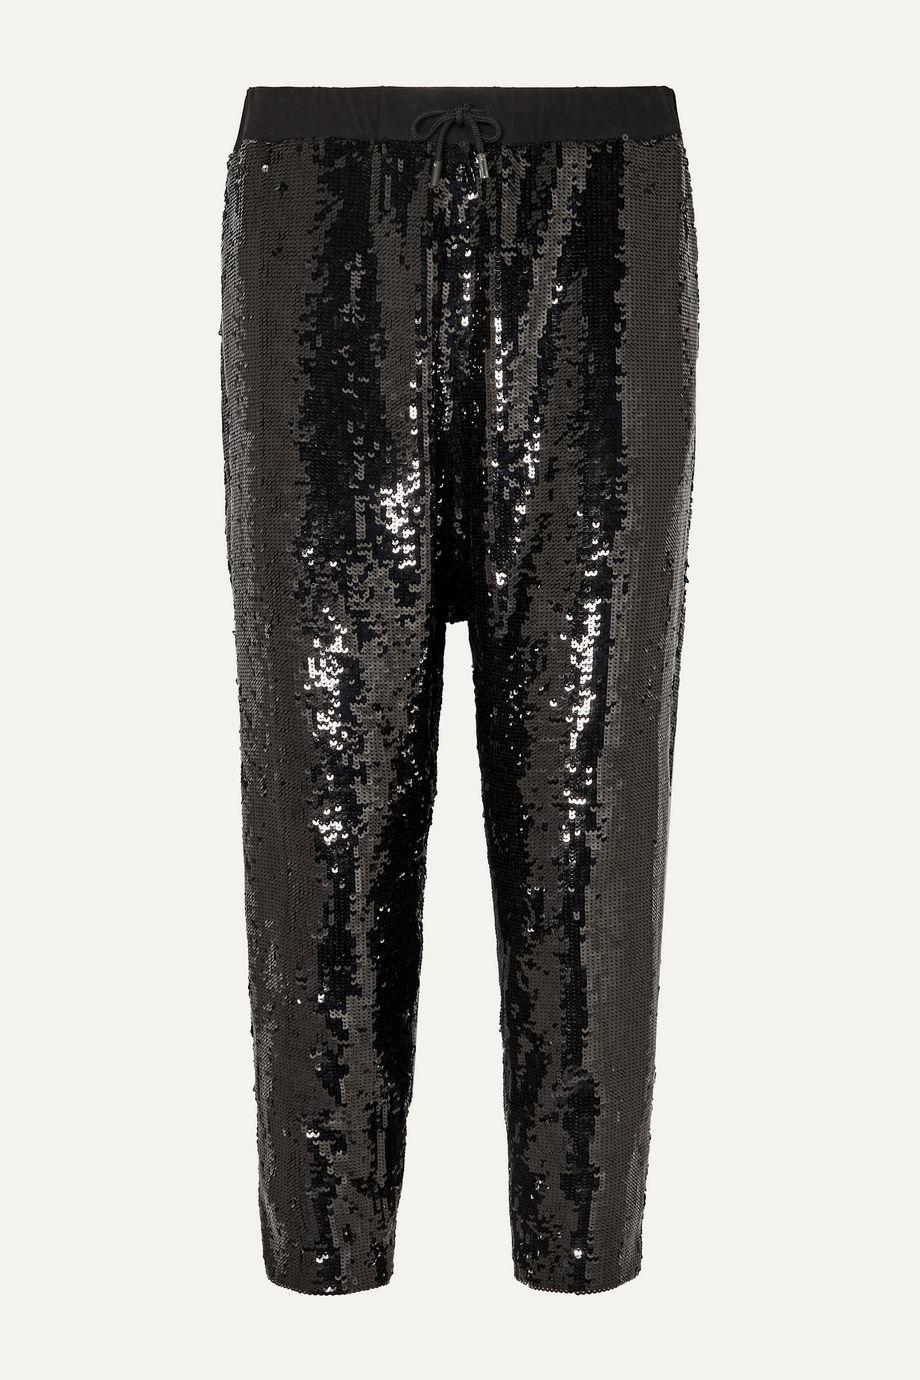 Nili Lotan Delancy cropped sequined crepe track pants